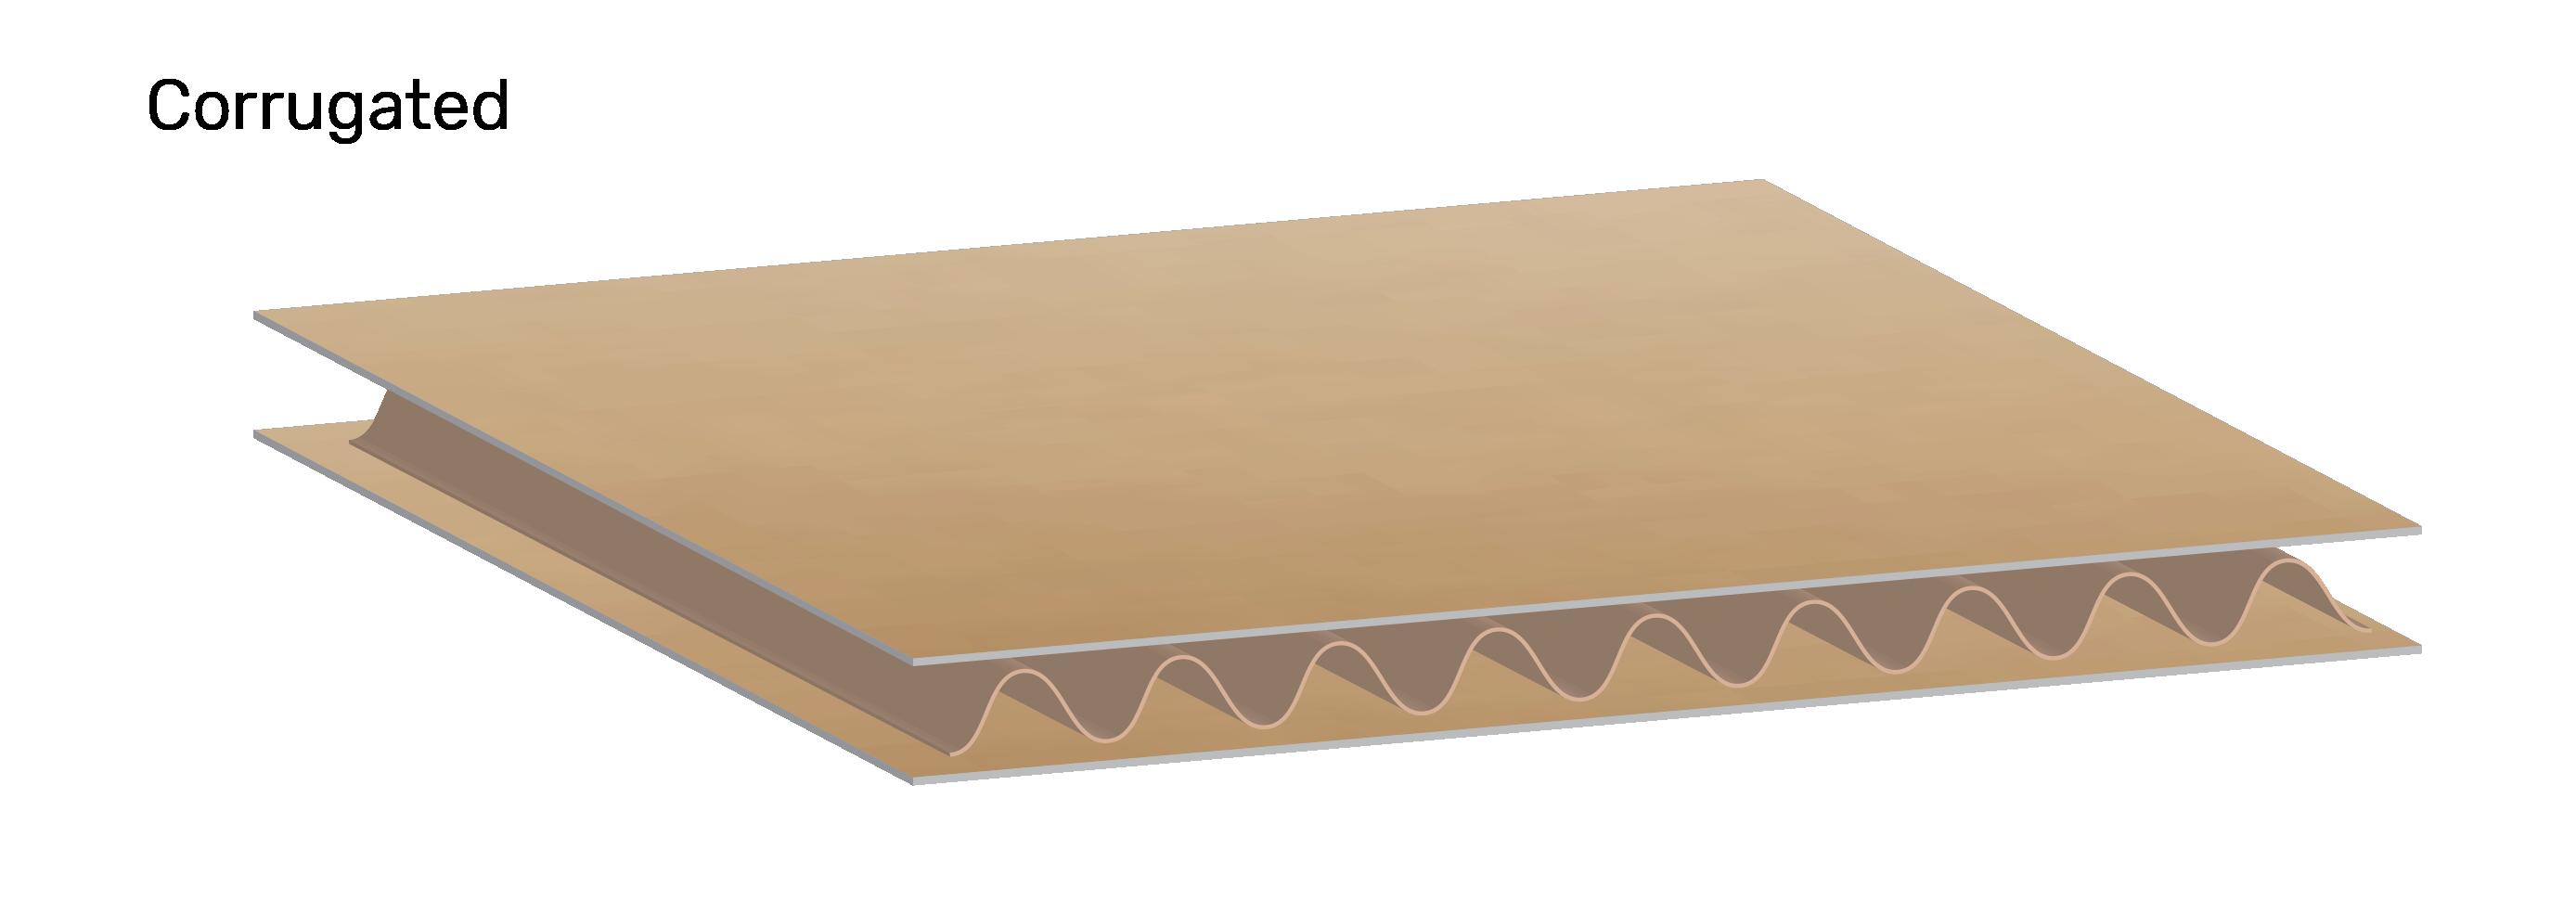 Corrugated Illustration